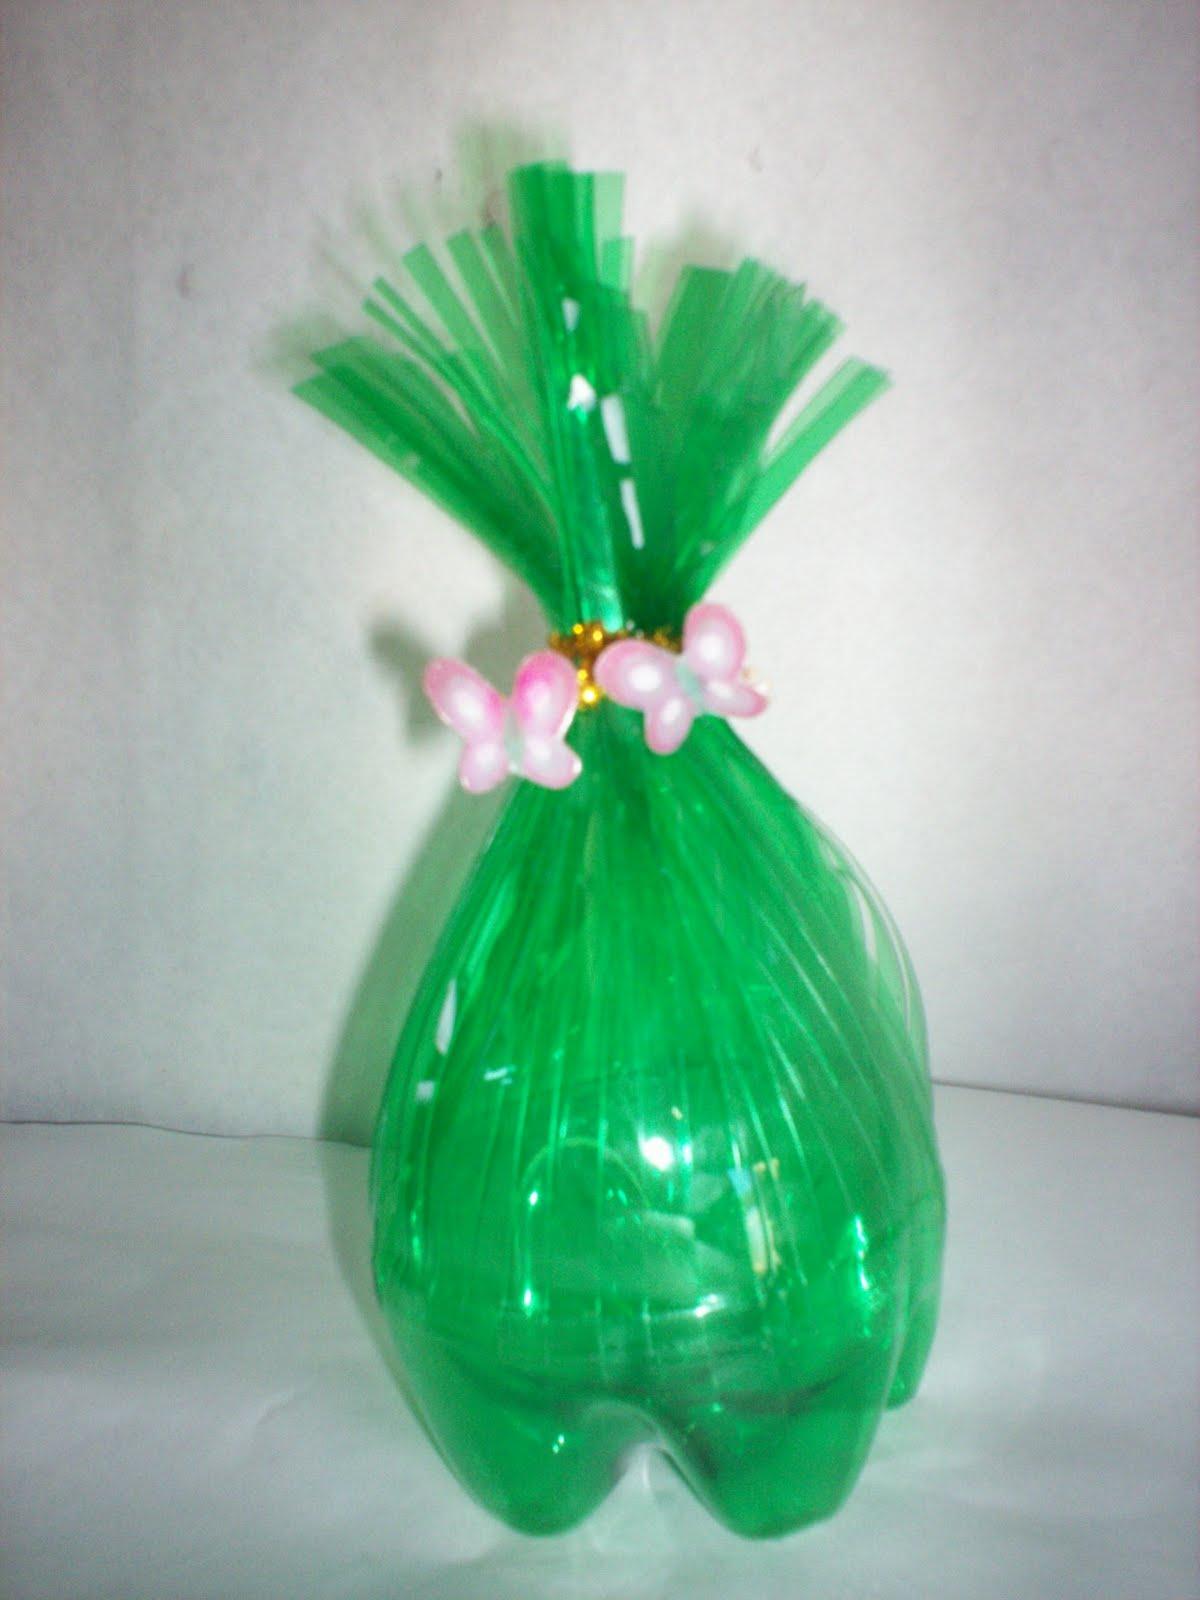 Sembrando mariposas cotillon muy sencillo con botellas de - Como pintar botellas de plastico ...